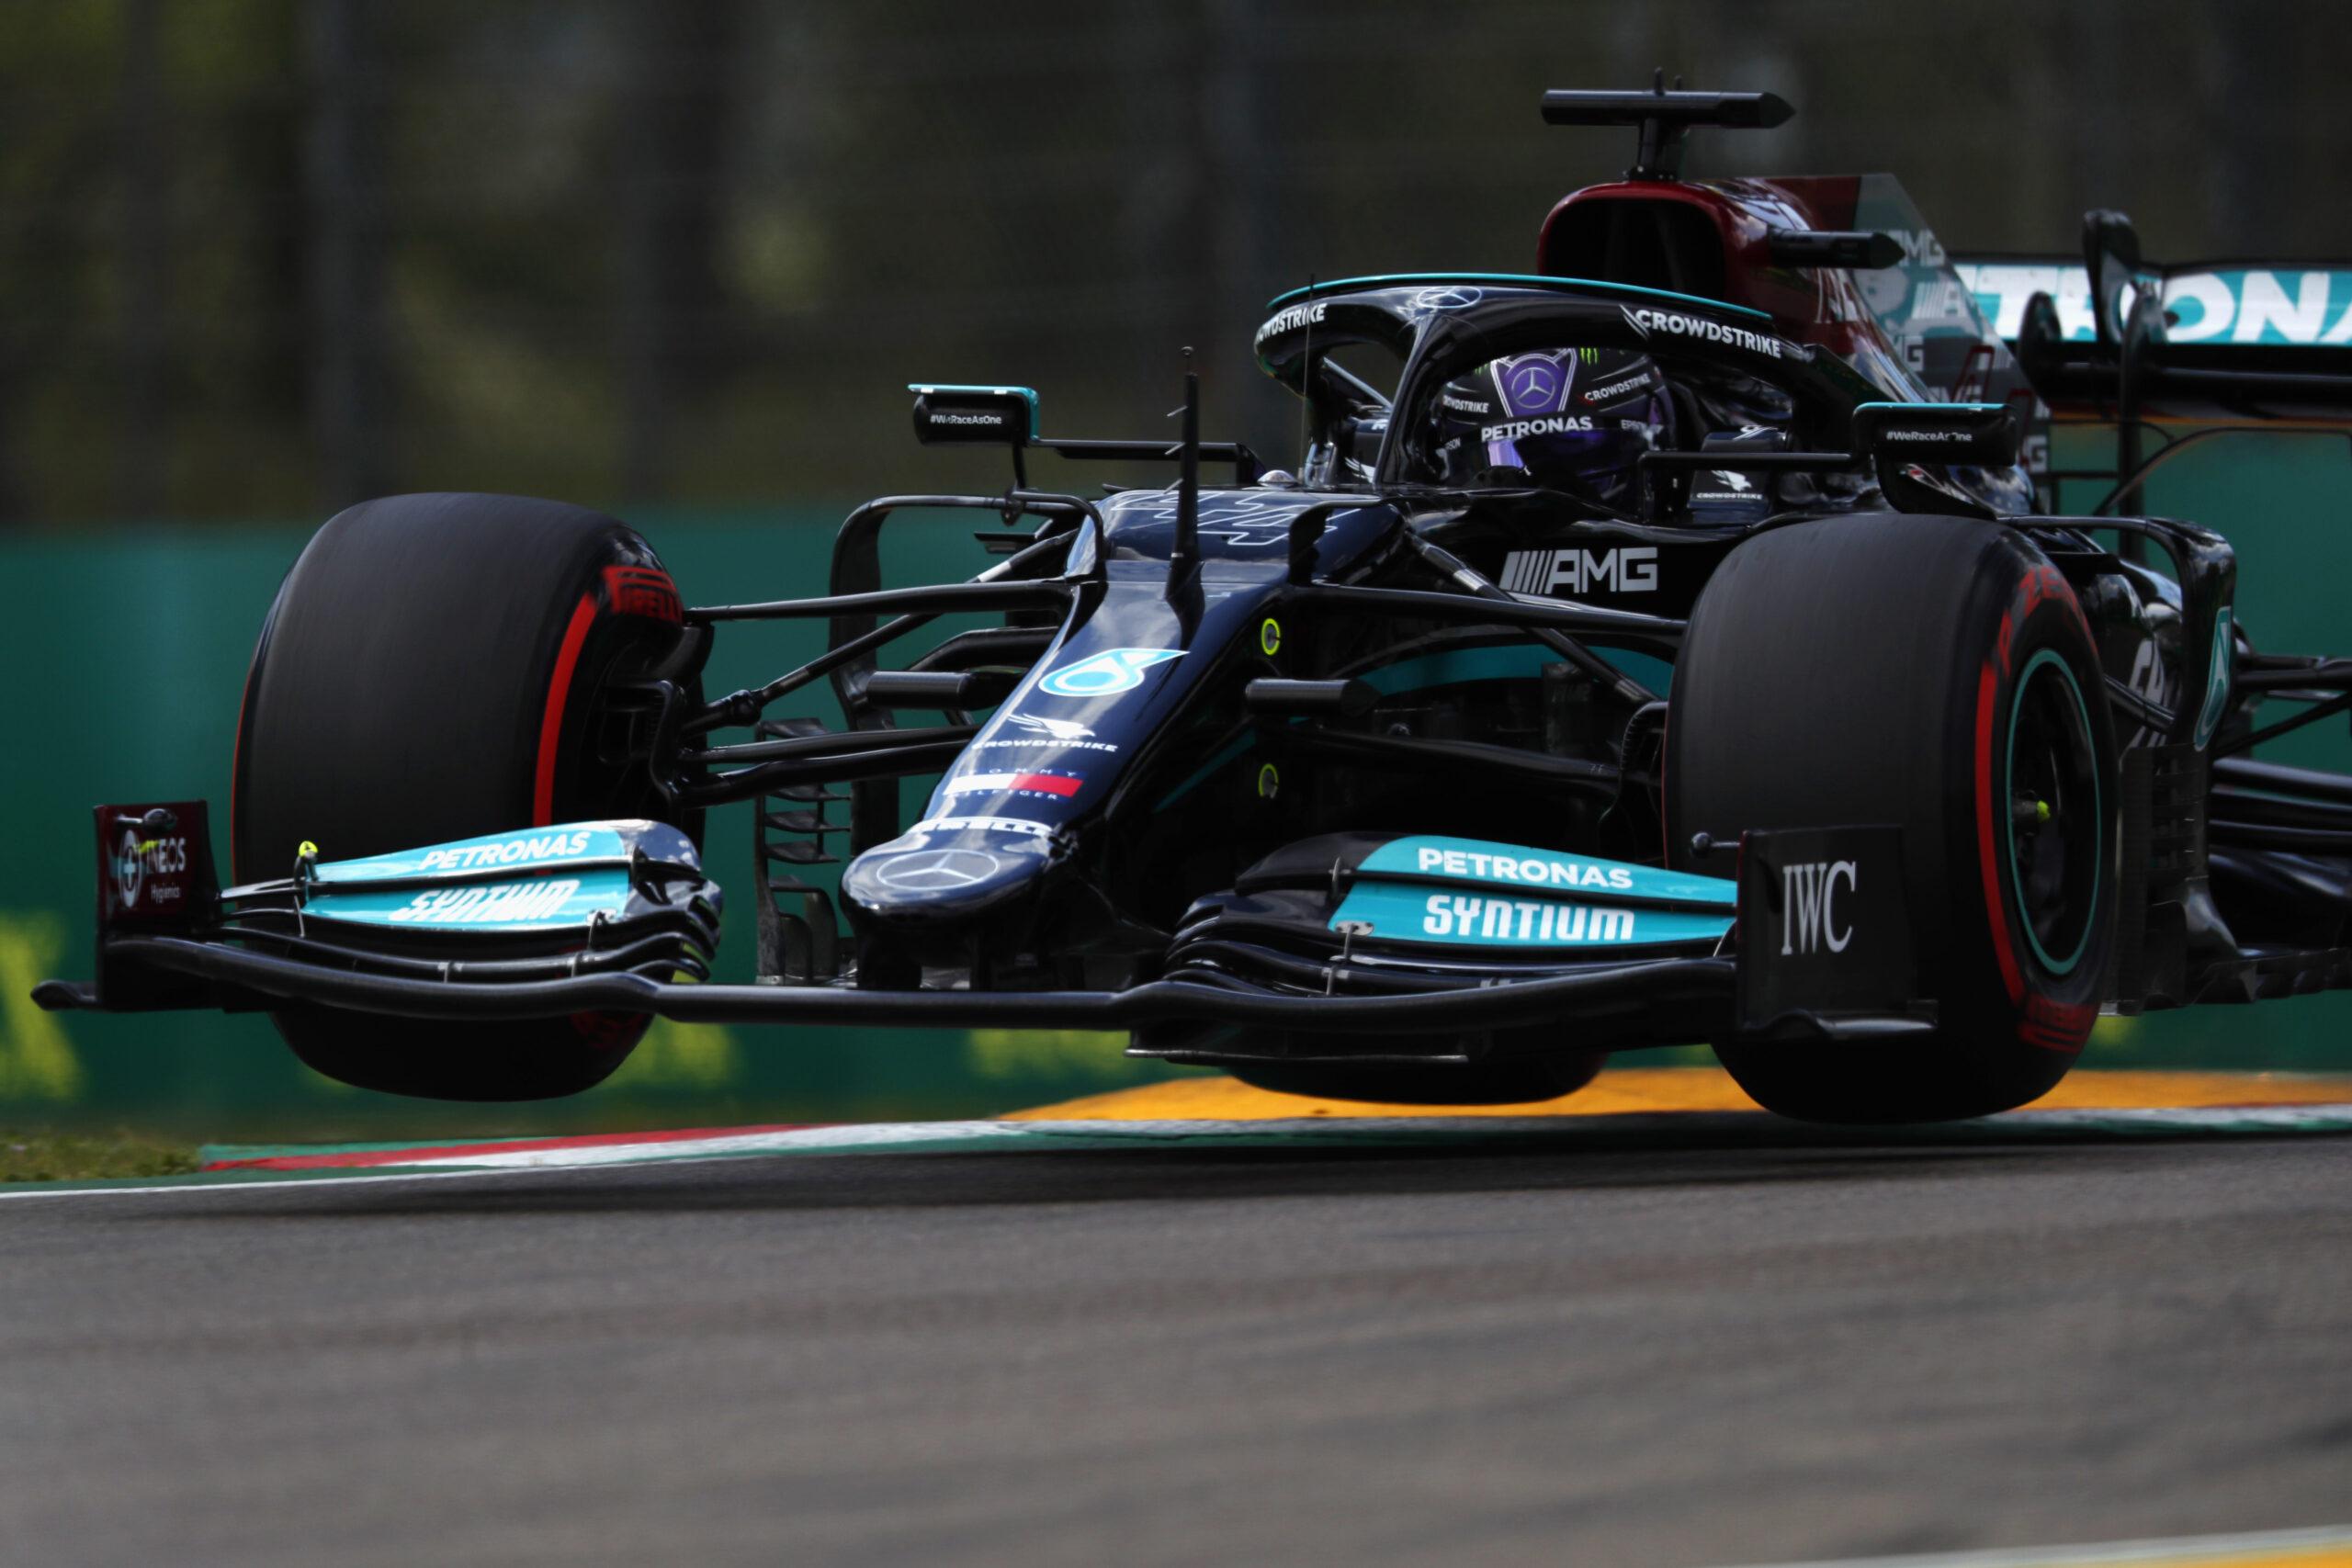 -F1-Ausfall-f-r-Bottas-in-Imola-Hamilton-nur-auf-Platz